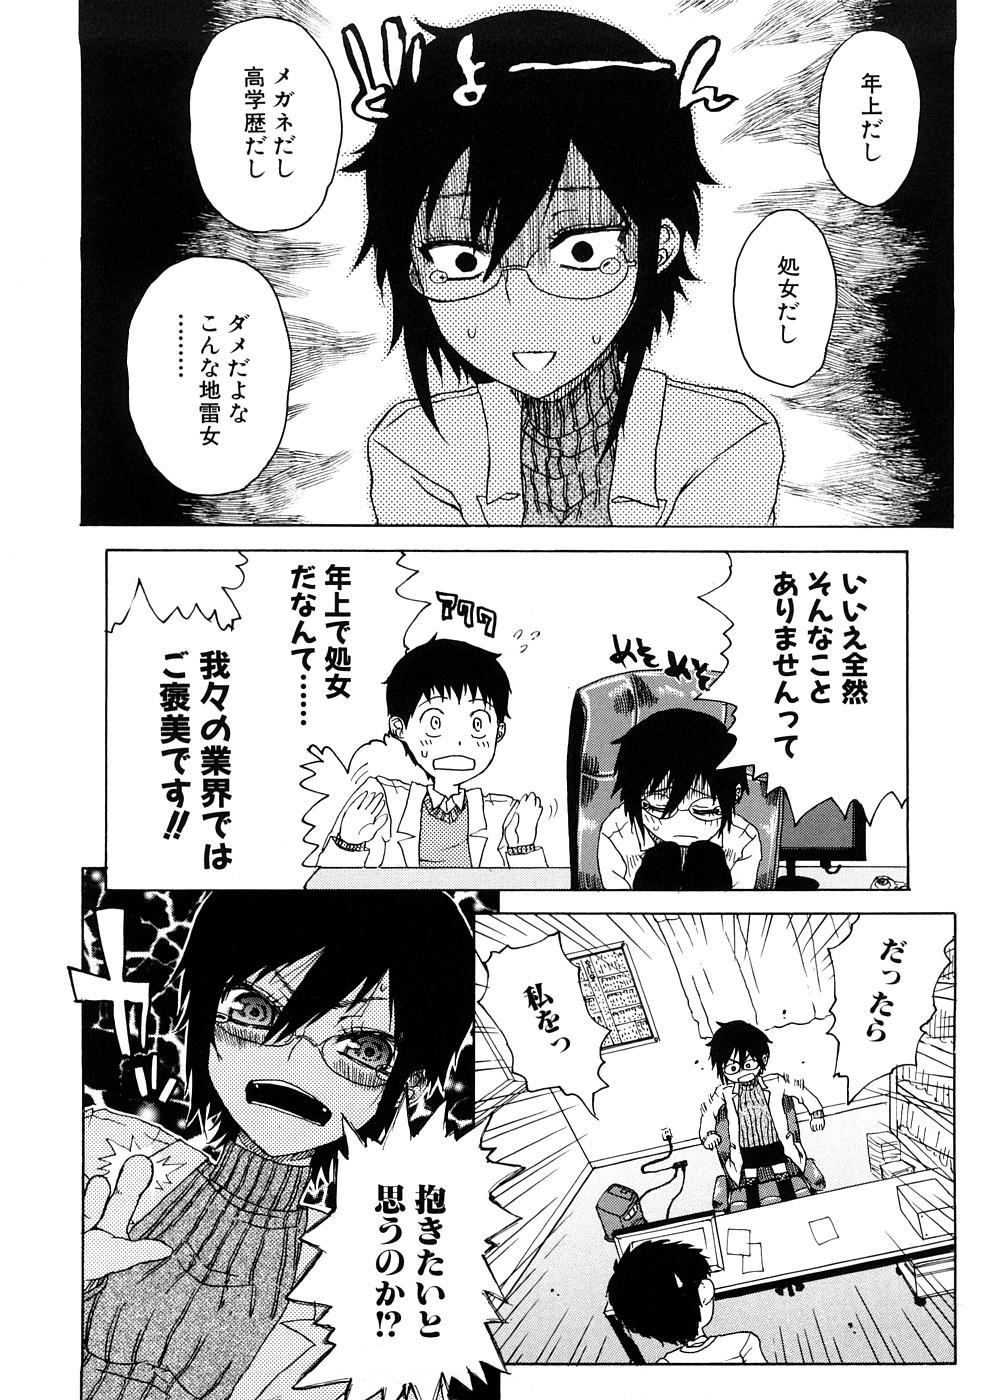 Ecchi de Jibunkatte de Kawaii Ko 53